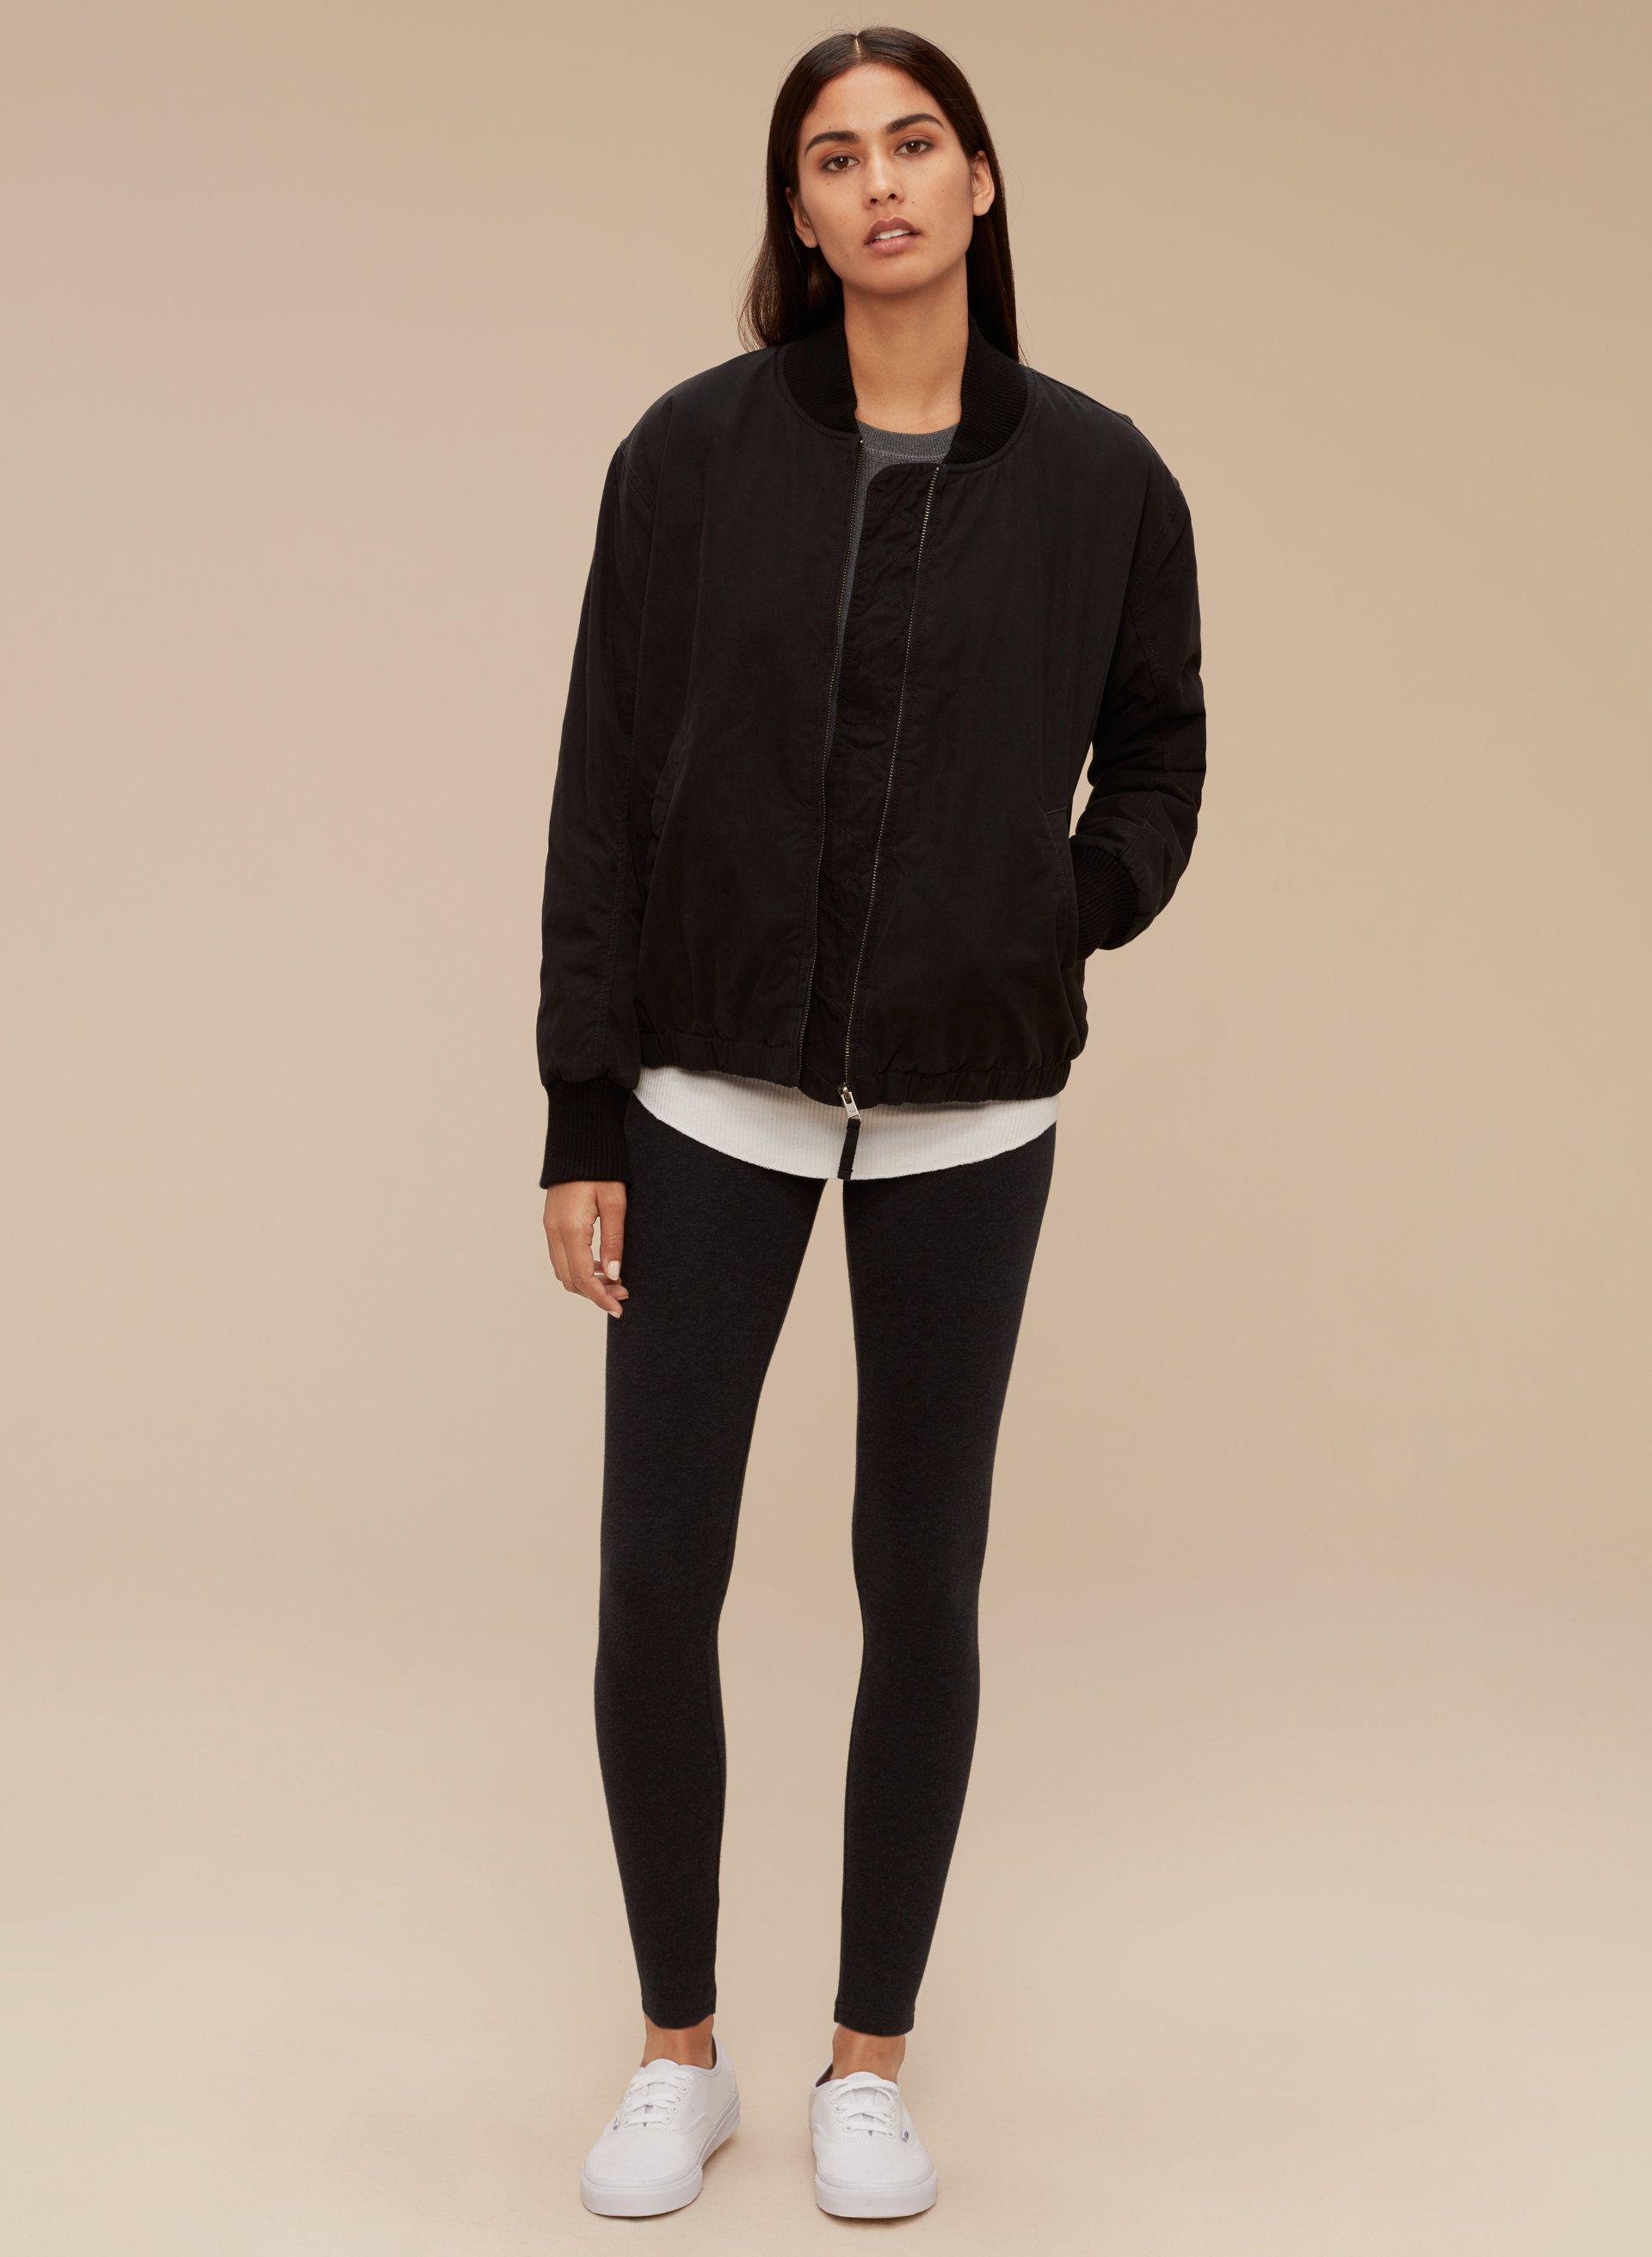 0d53e2b0e Equator legging | brandy's wishlist | Pants, Jackets, Bomber jacket